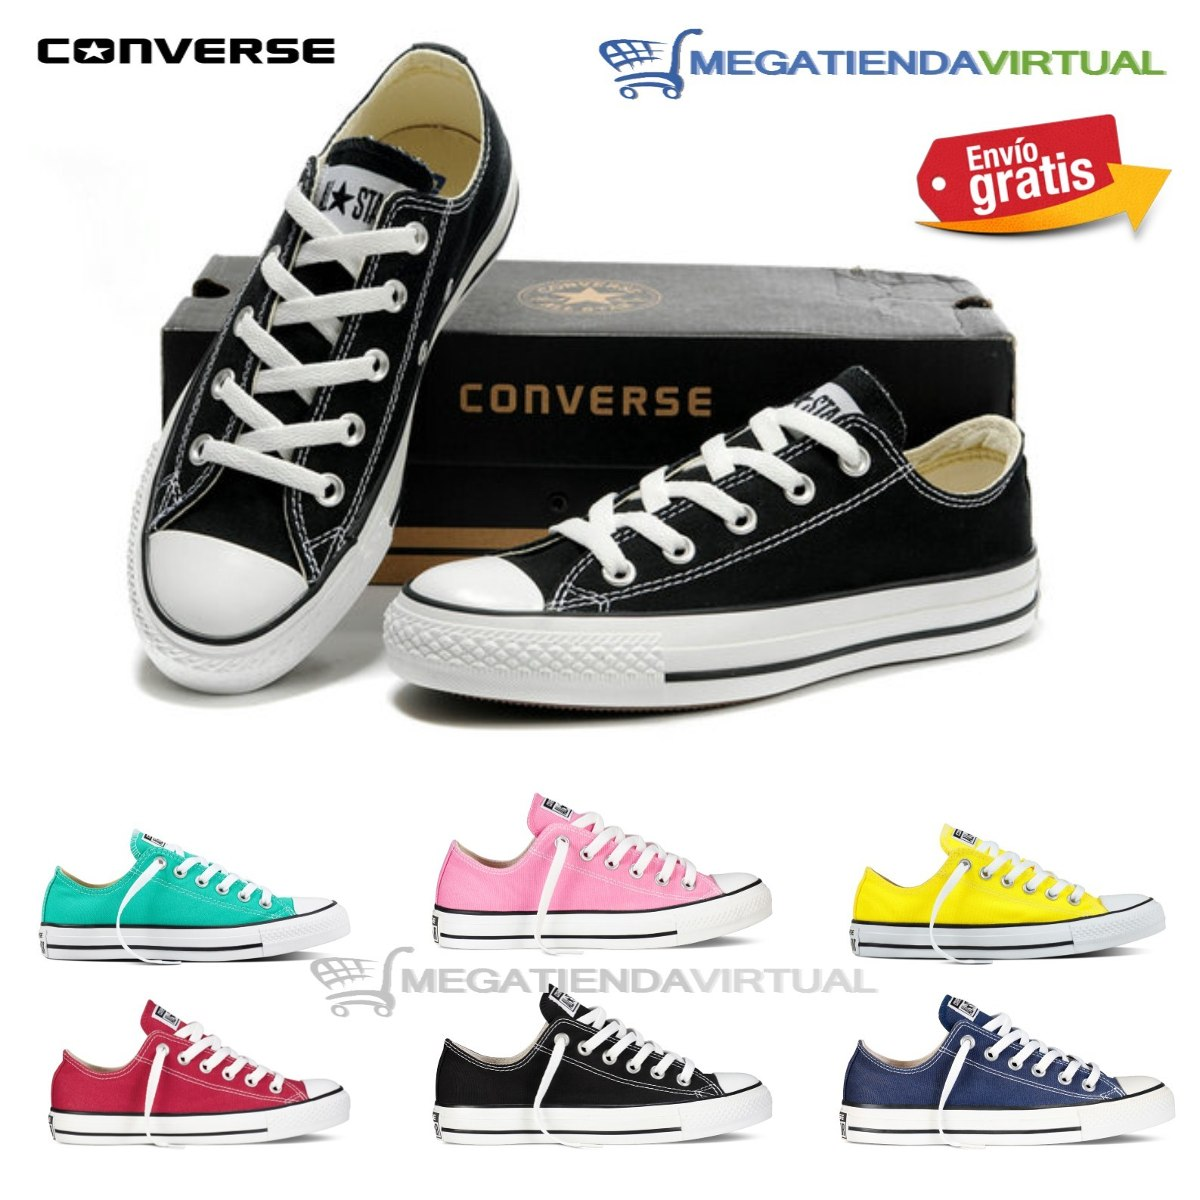 ec952165f552e Zapatos converse para mujer online hasta que off descuento jpg 1200x1200 Zapatos  converse para mujer